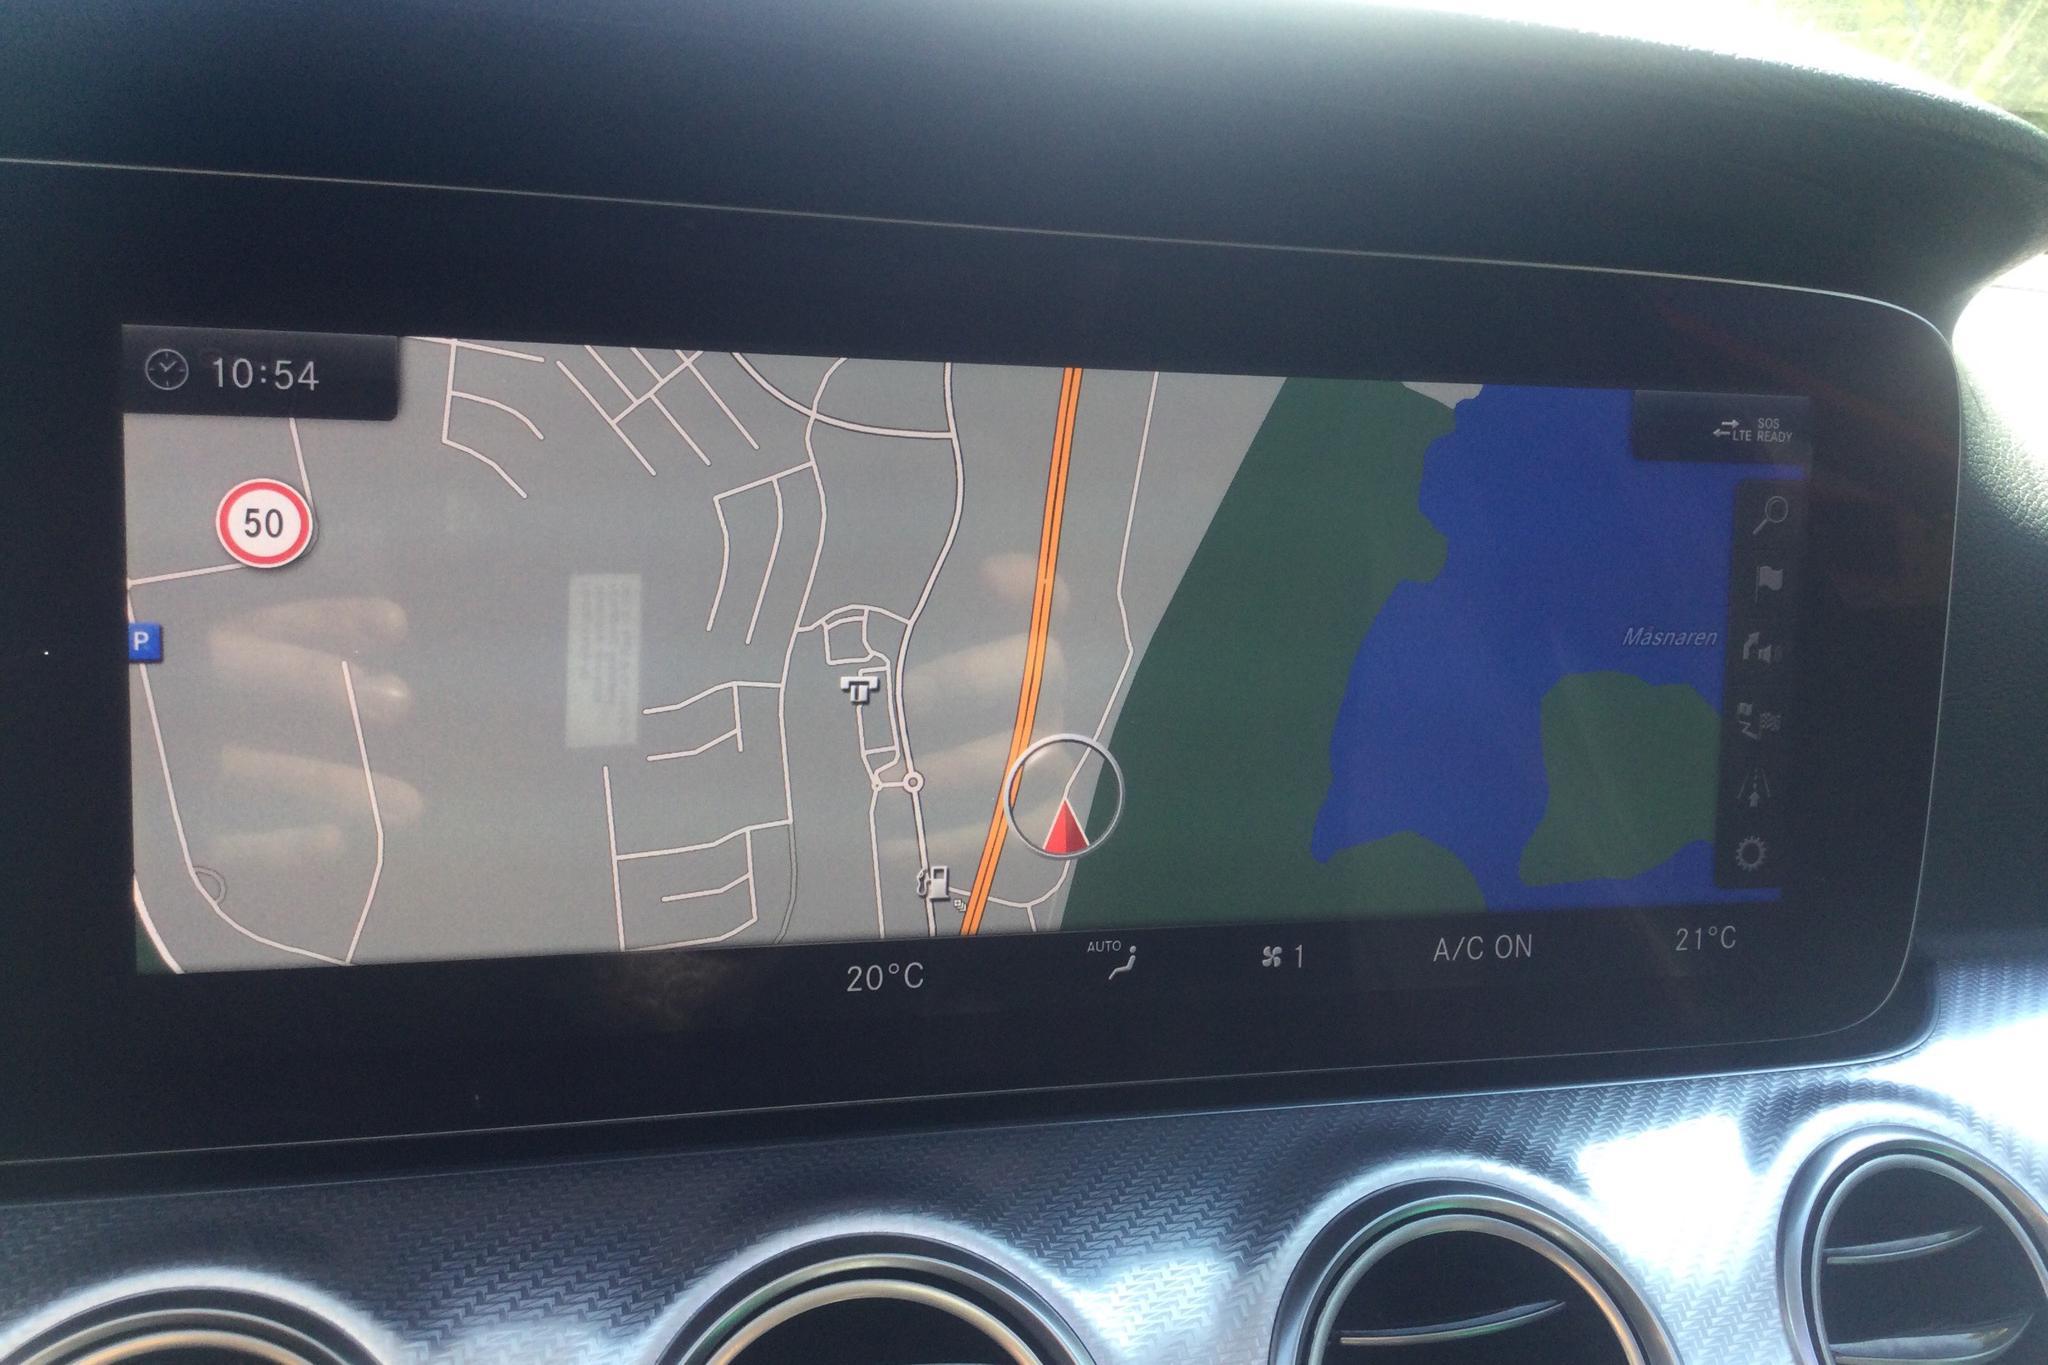 Mercedes E 220 d 4MATIC Kombi All-Terrain S213 (194hk) - 3 631 mil - Automat - silver - 2018